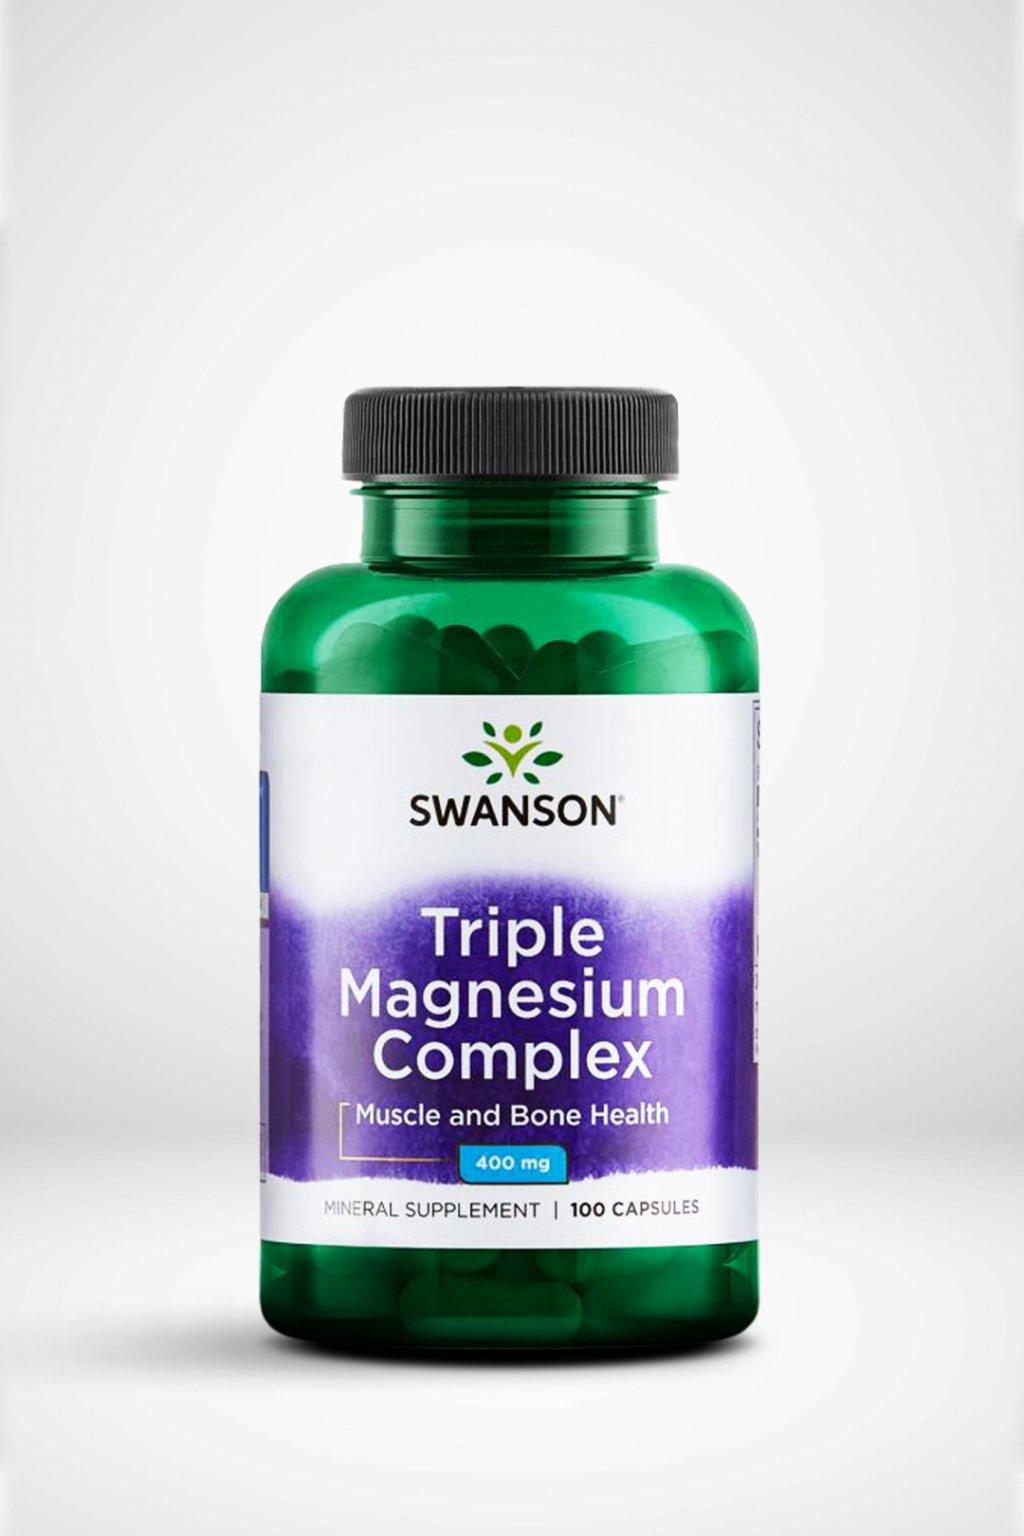 Swanson Triple Magnézium